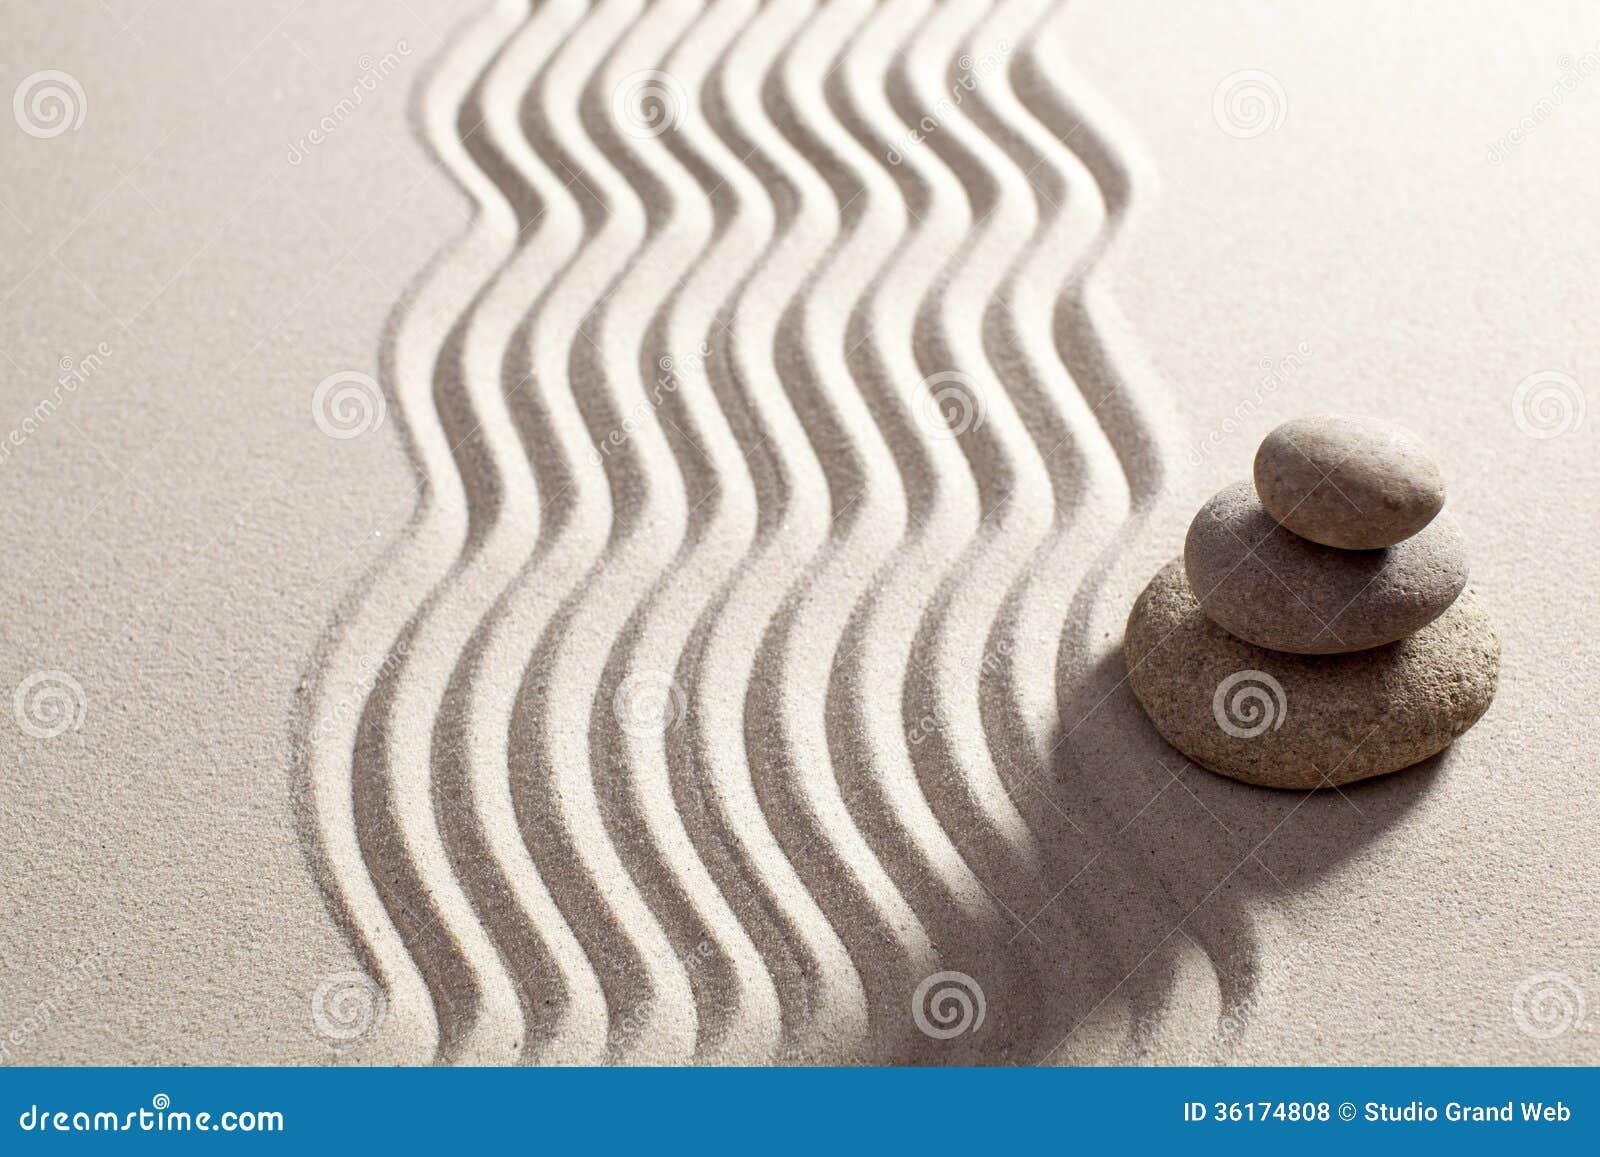 Seeking for solutions with zen attitude royalty free stock photos image 36 - Symbole zen attitude ...